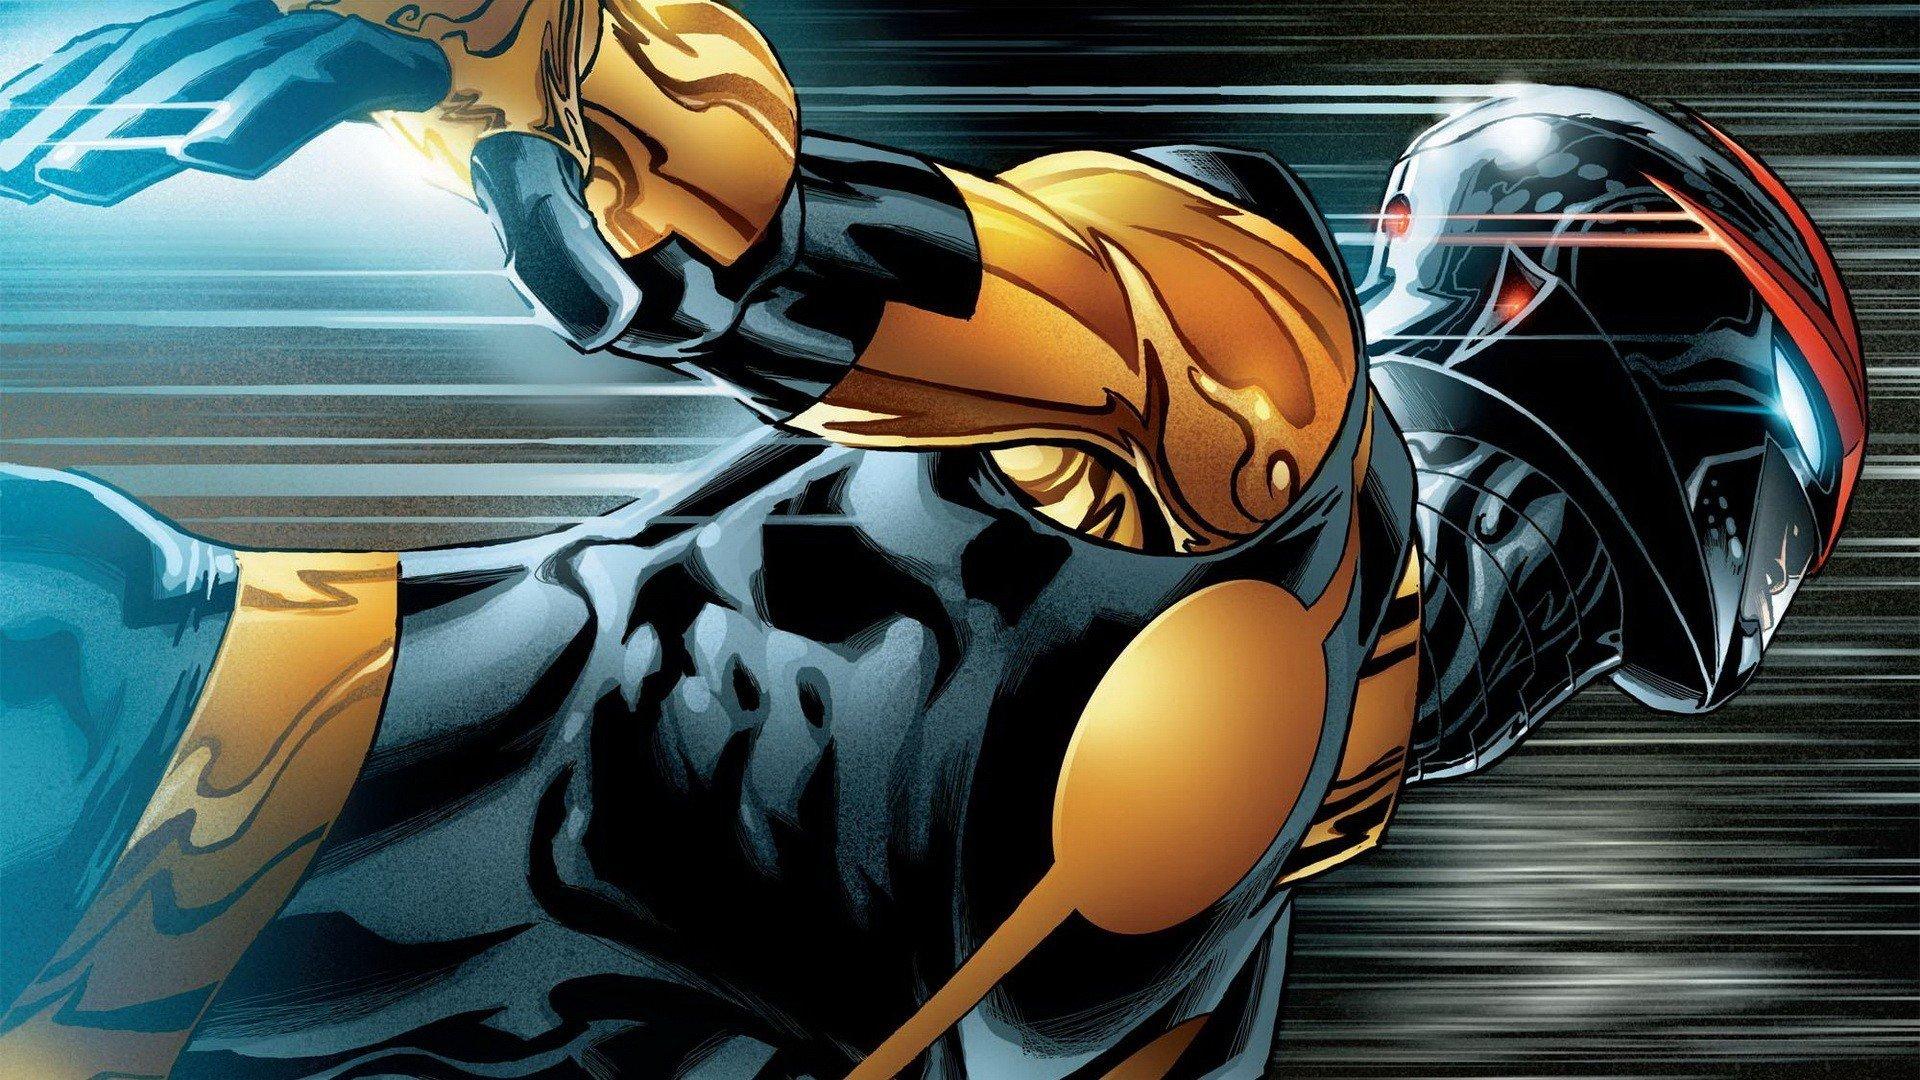 NOVA corps marvel superhero 22 wallpaper 1920x1080 246446 1920x1080